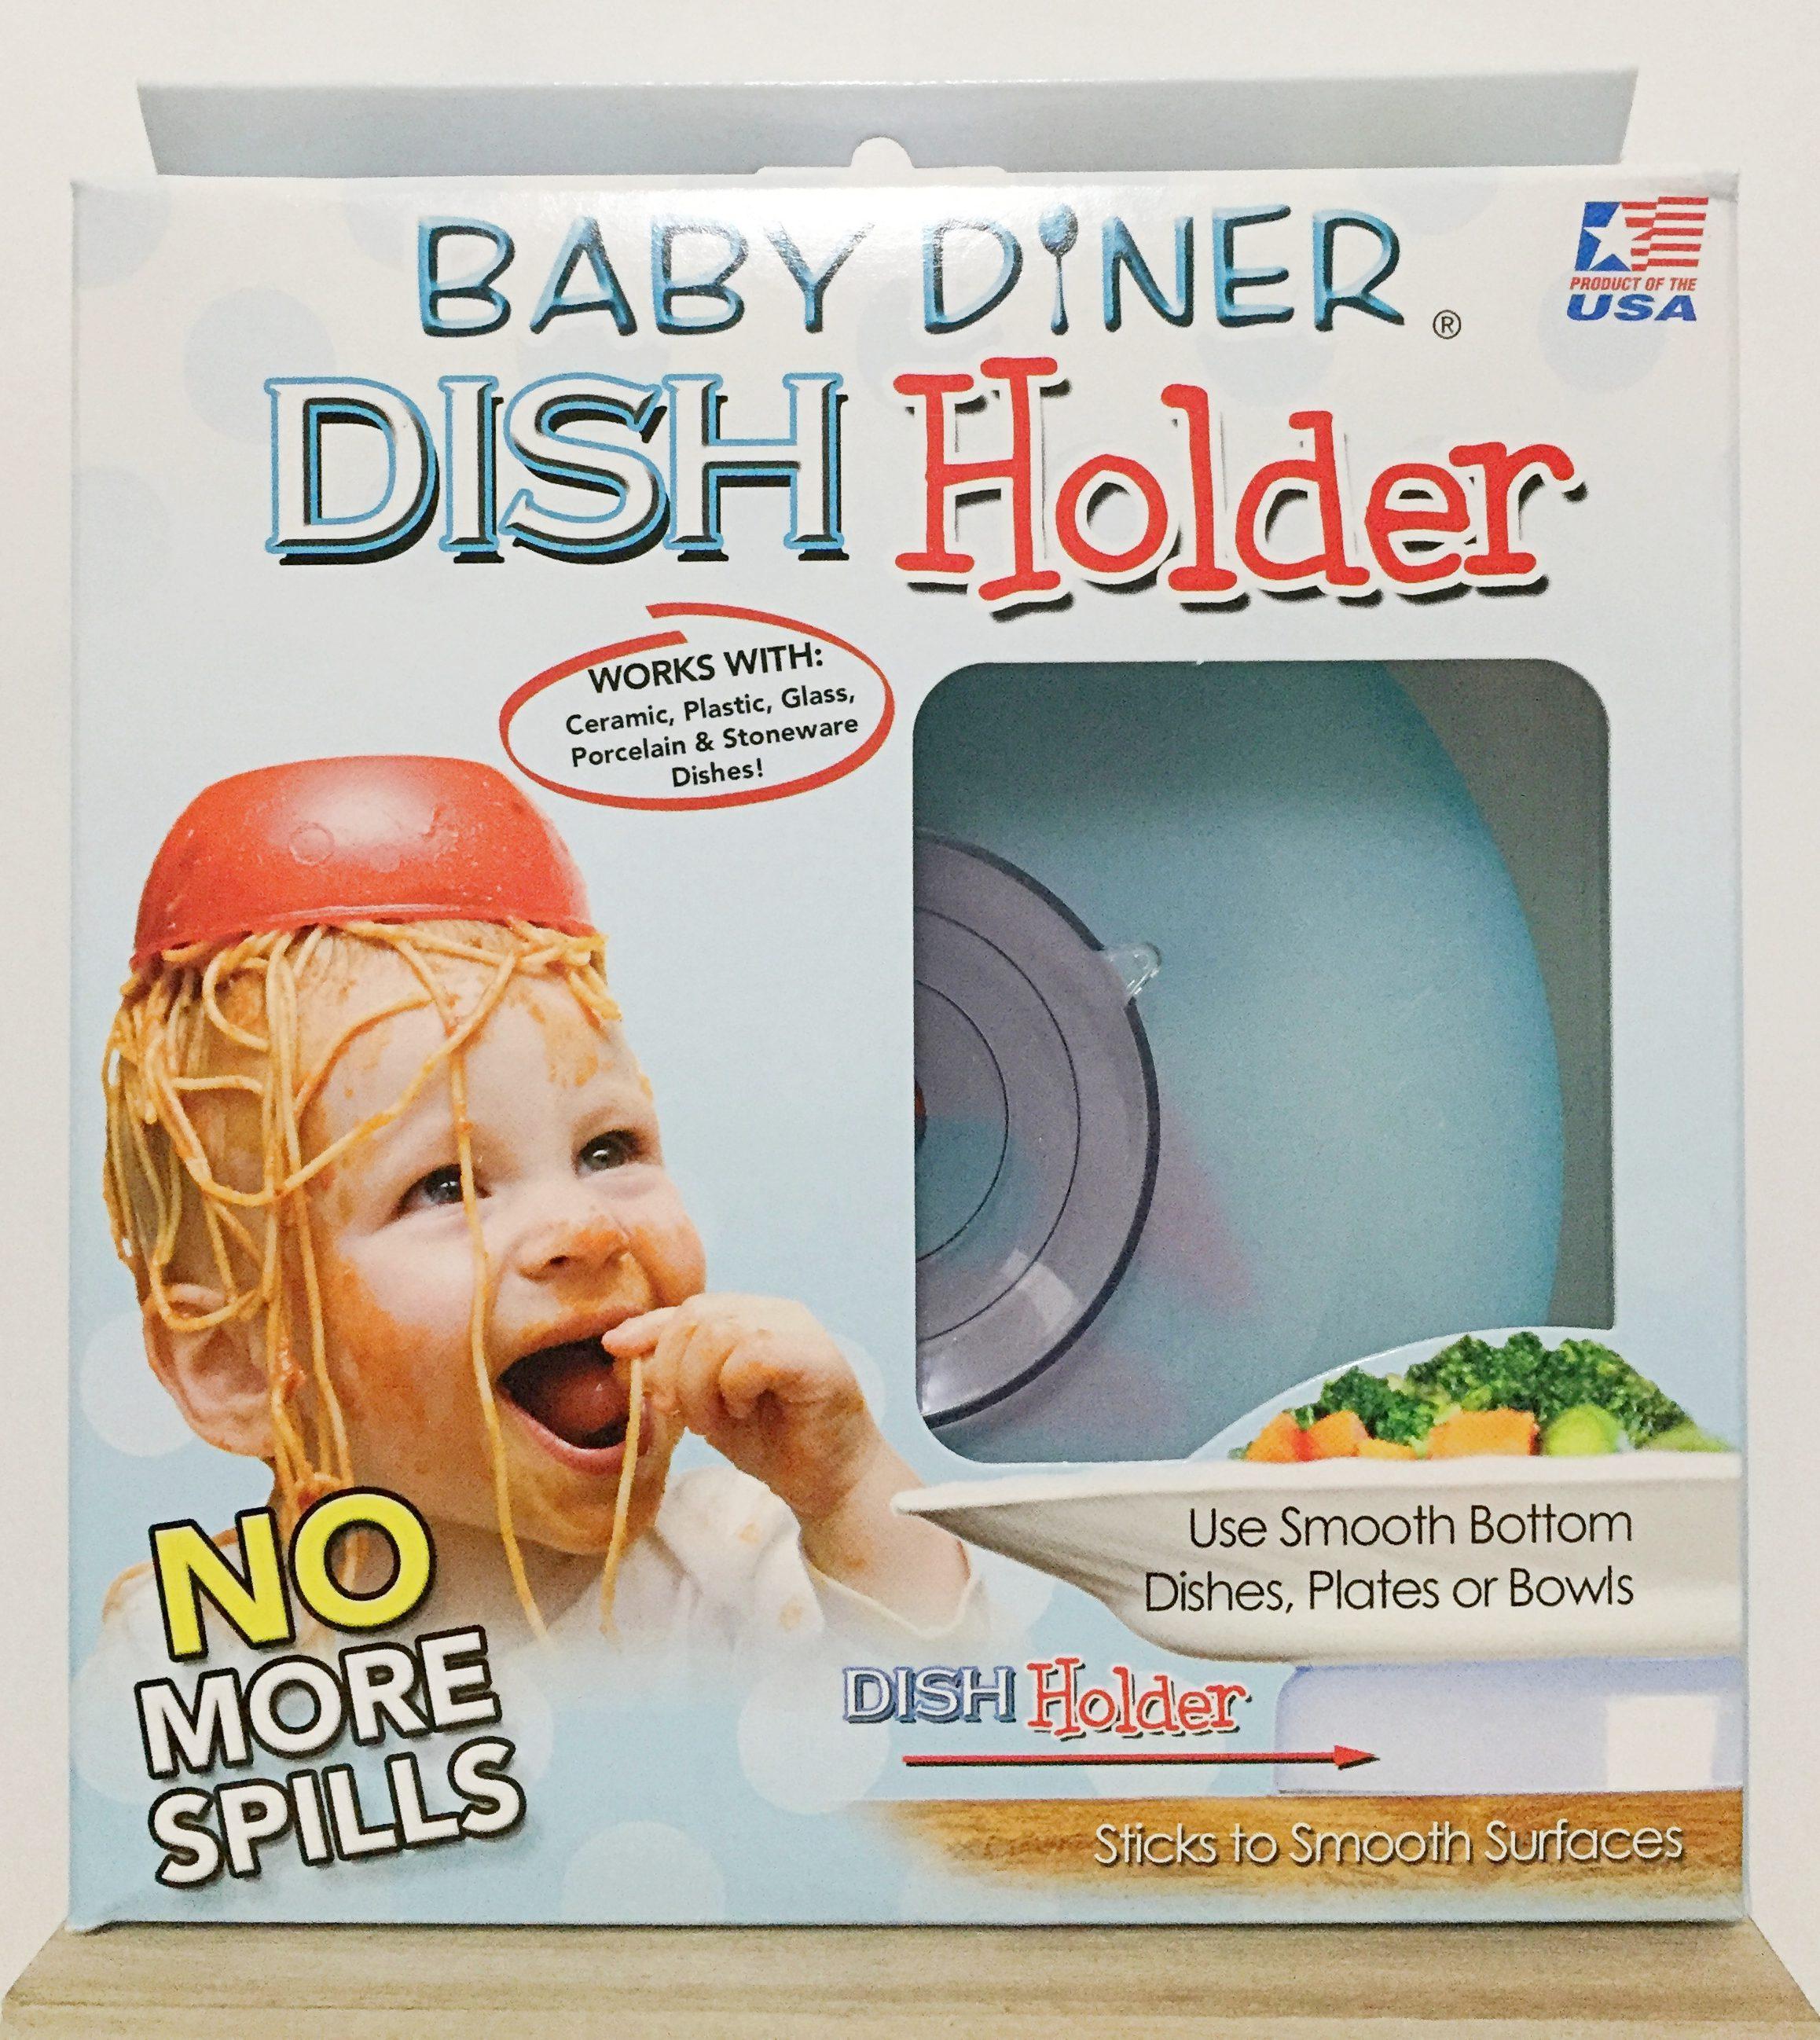 《★Baby Diner Dish Holder 》嬰兒餐具強力吸盤架 美國代購